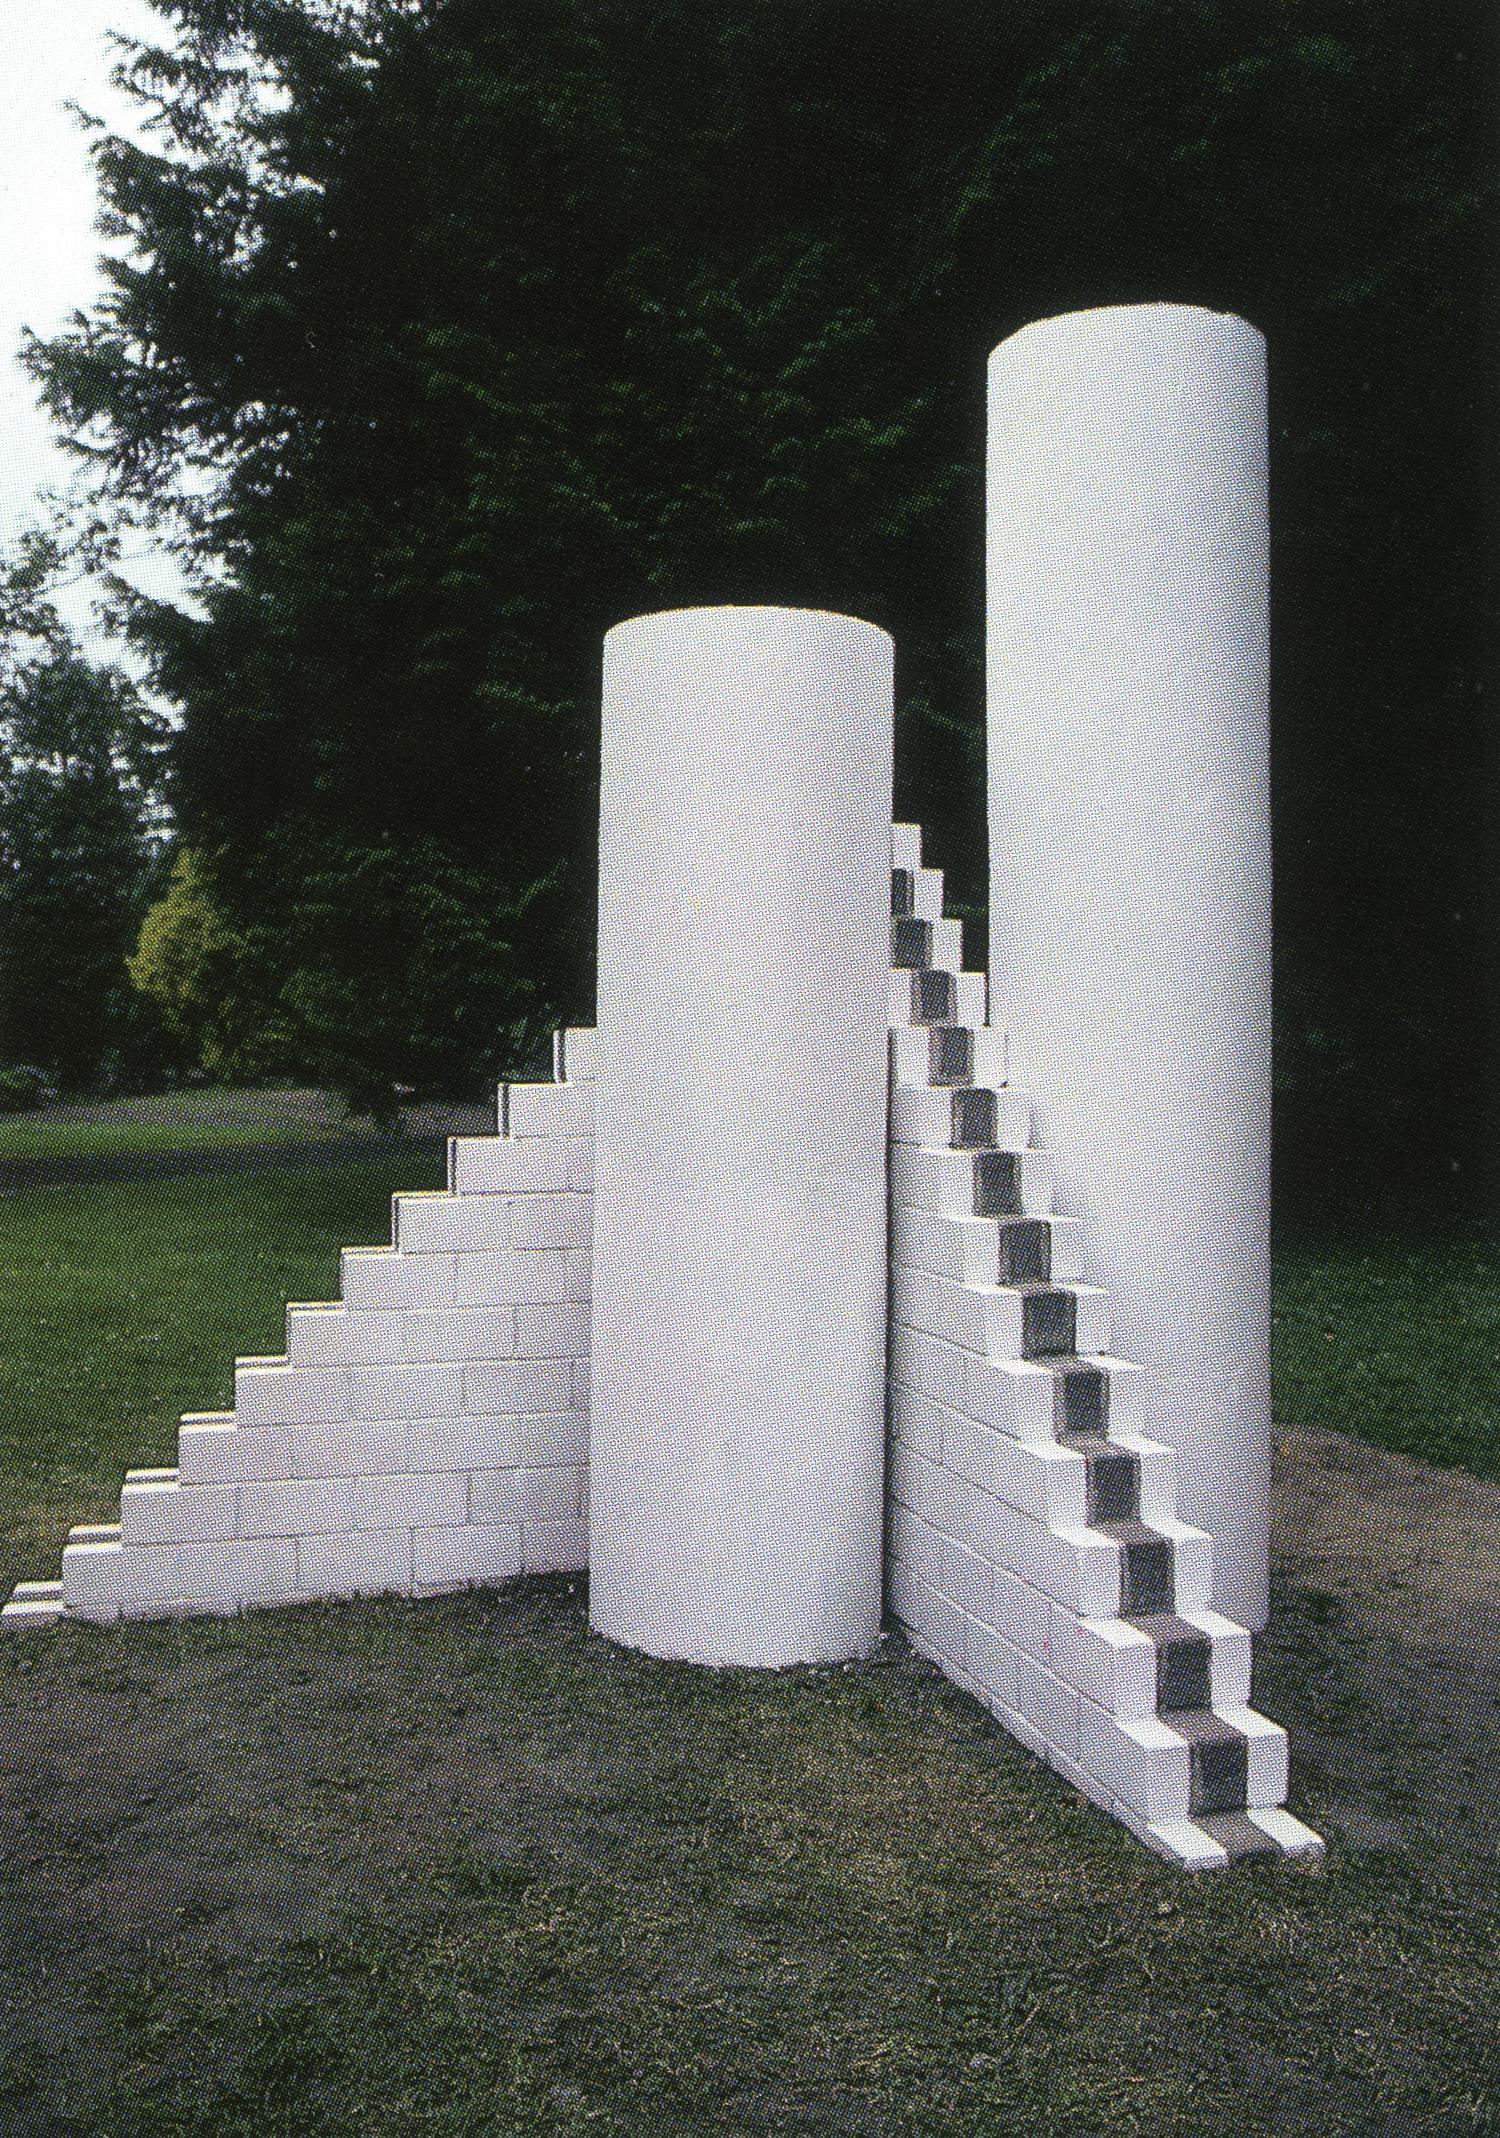 Fitzgeralds Park, Cork, Ireland; 1994.  Cuis Na Laoi.  8' x 6' x 7'.